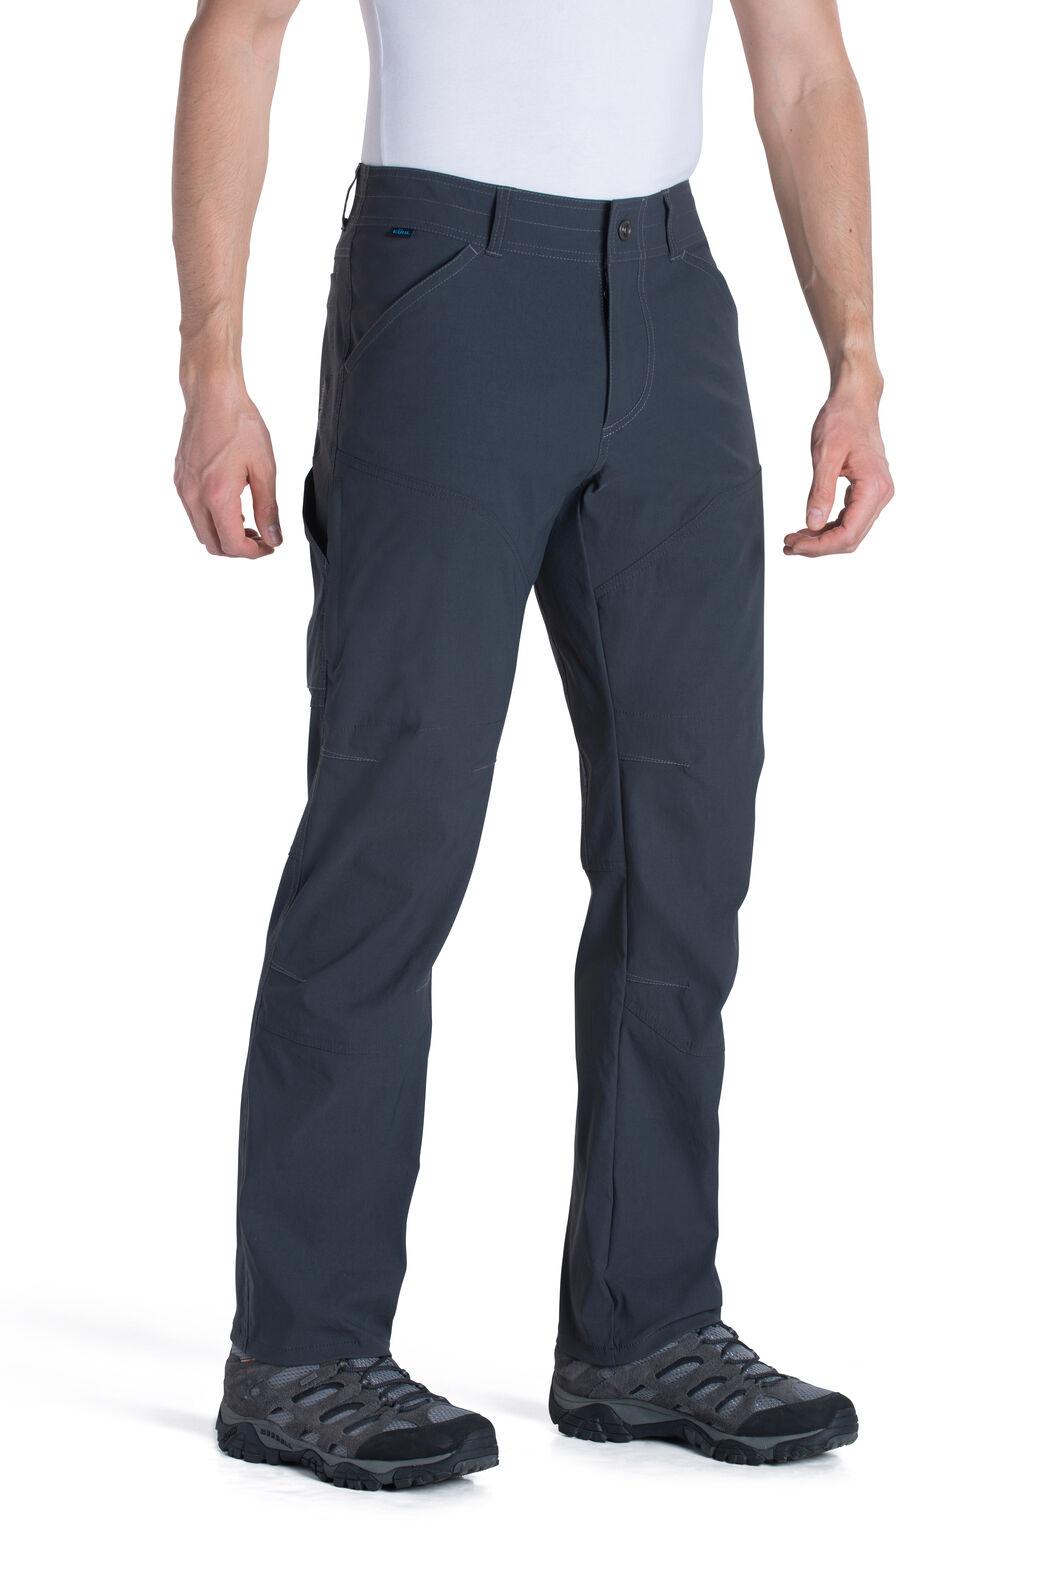 Kuhl Renegade Pants (32 inch leg) - Men's, Black, hi-res